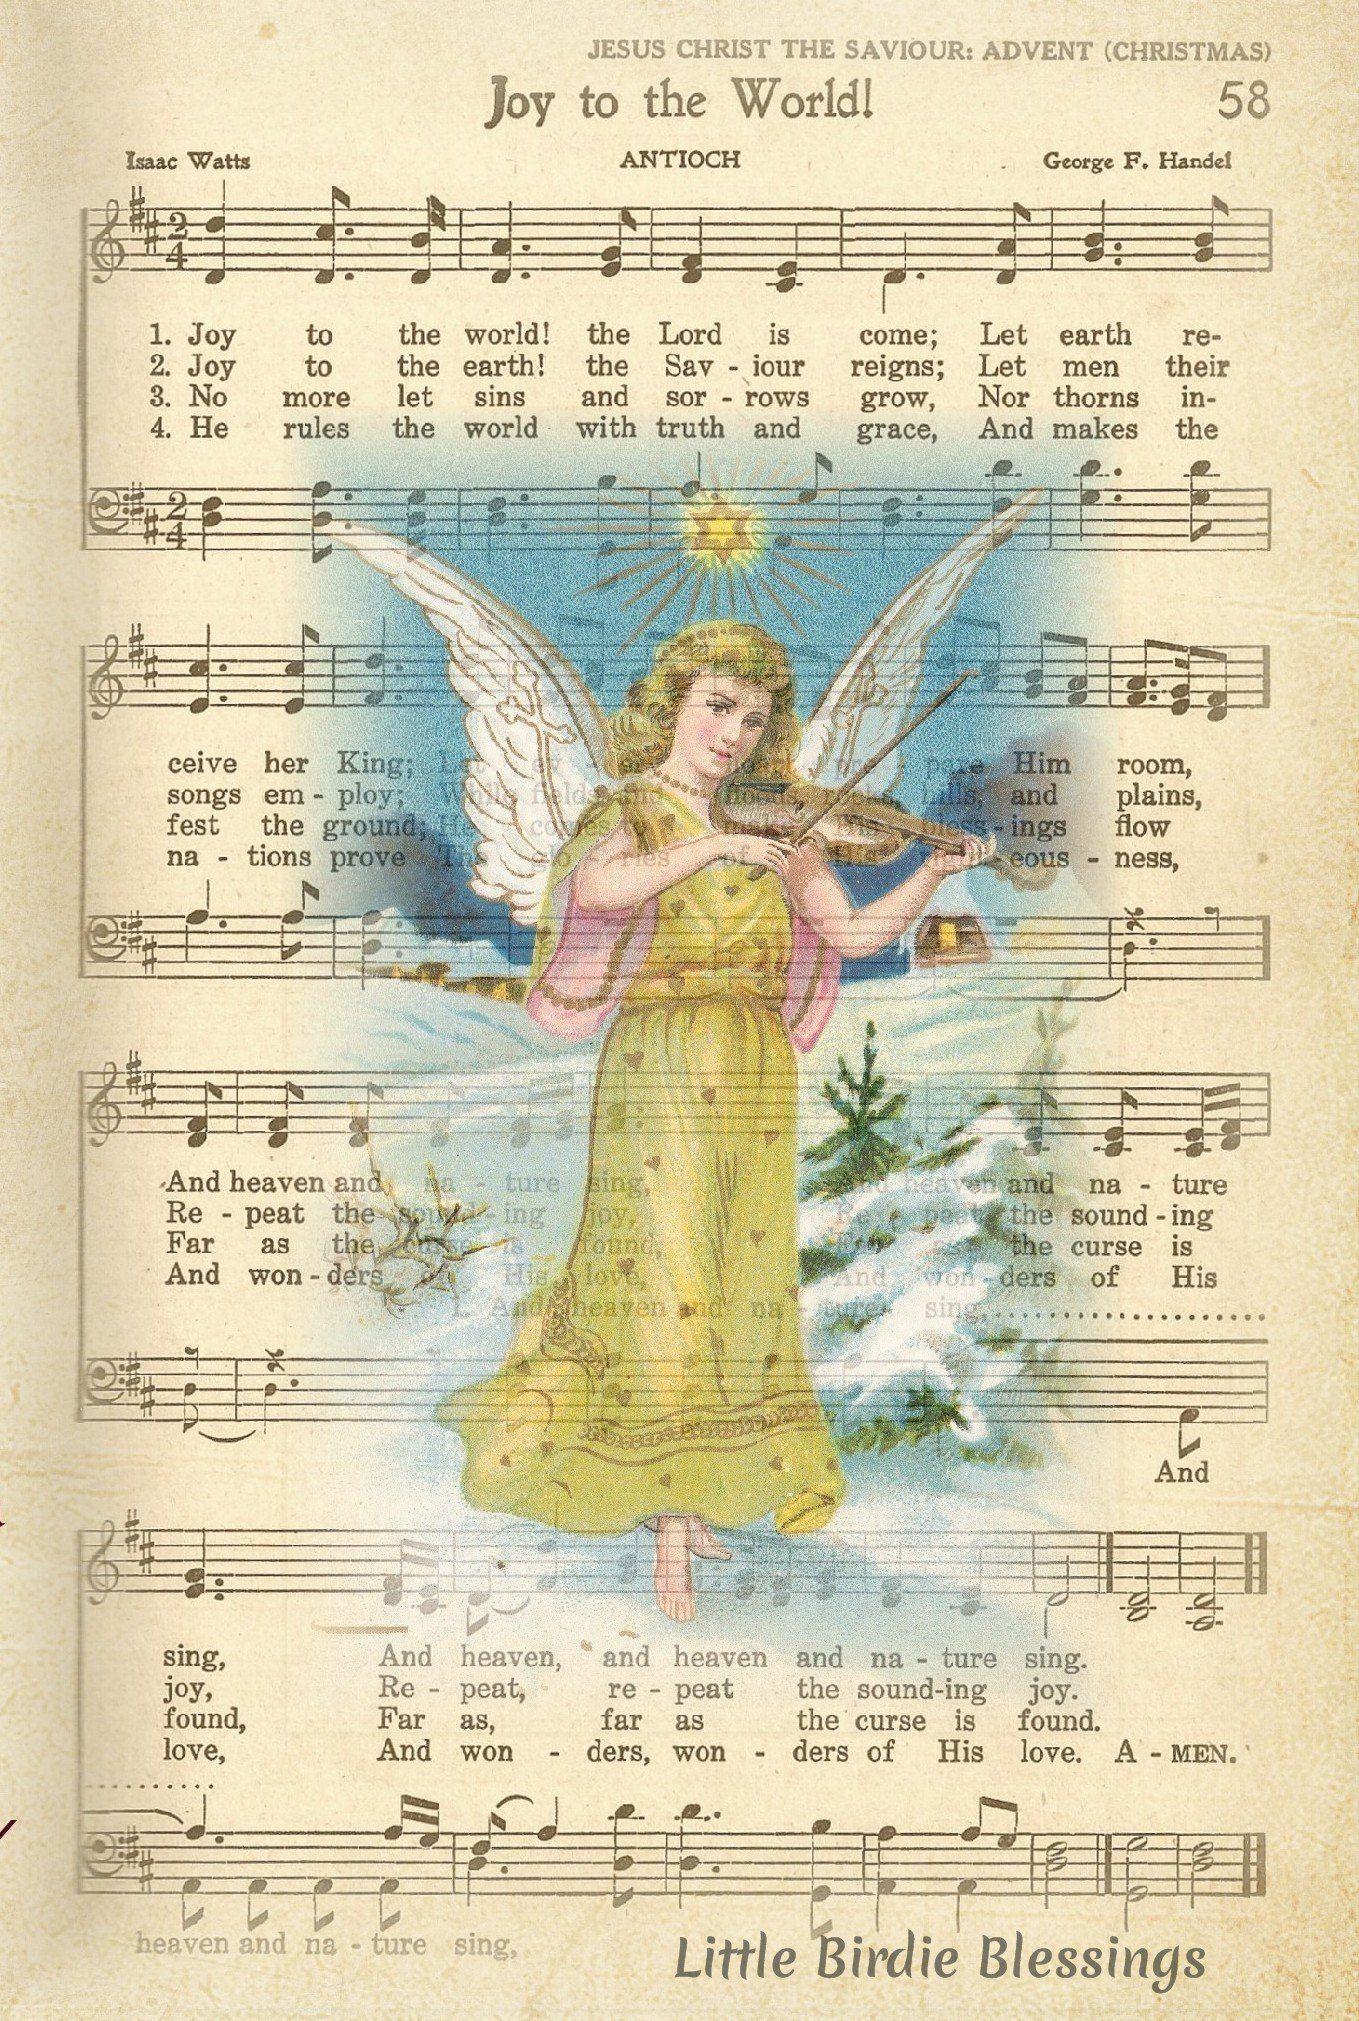 Joy To The World | Hymns of praise, Joy to the world, Hymn music